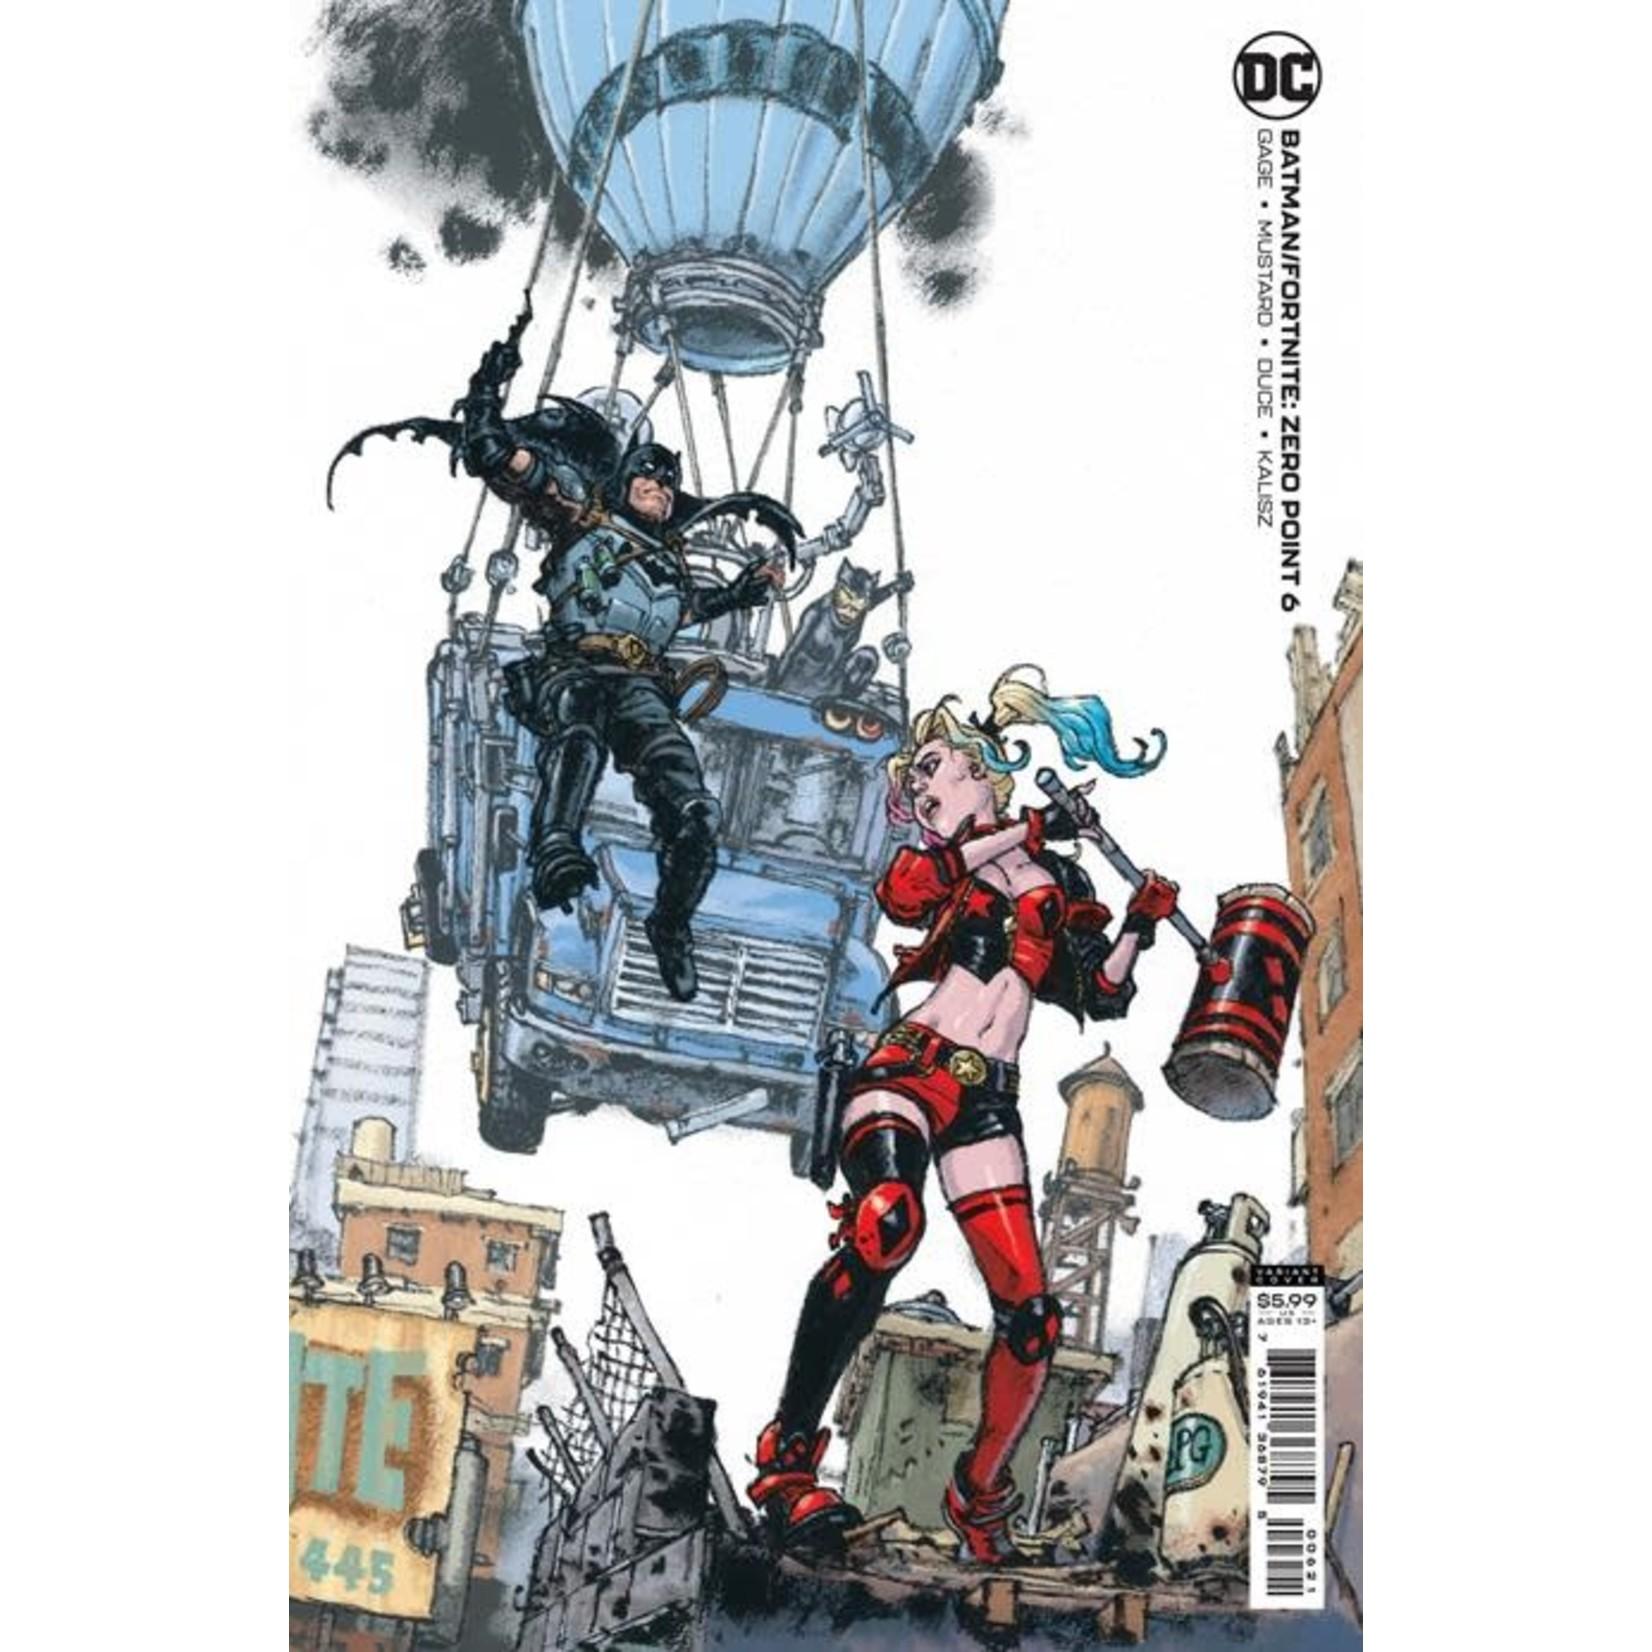 DC COMICS Batman Fortnite Zero Point #6 B